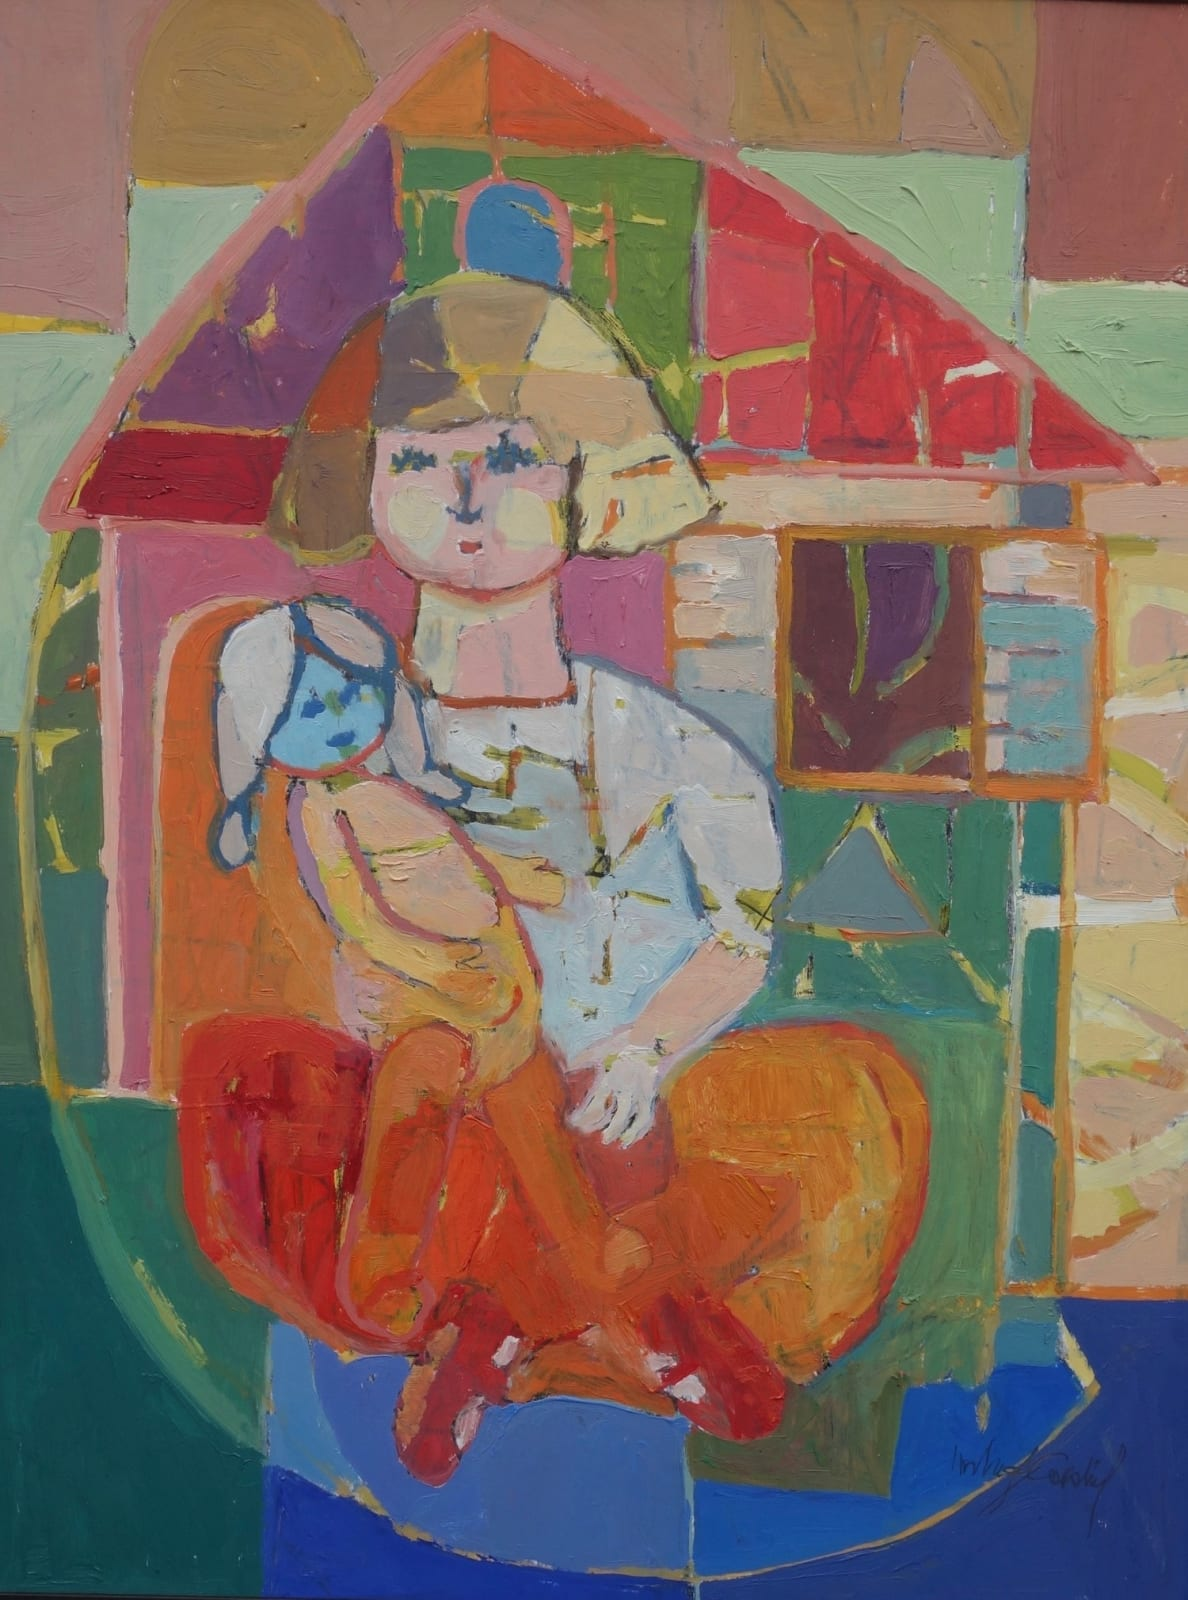 Catherine Imhof-Cardinal, The Wendy house